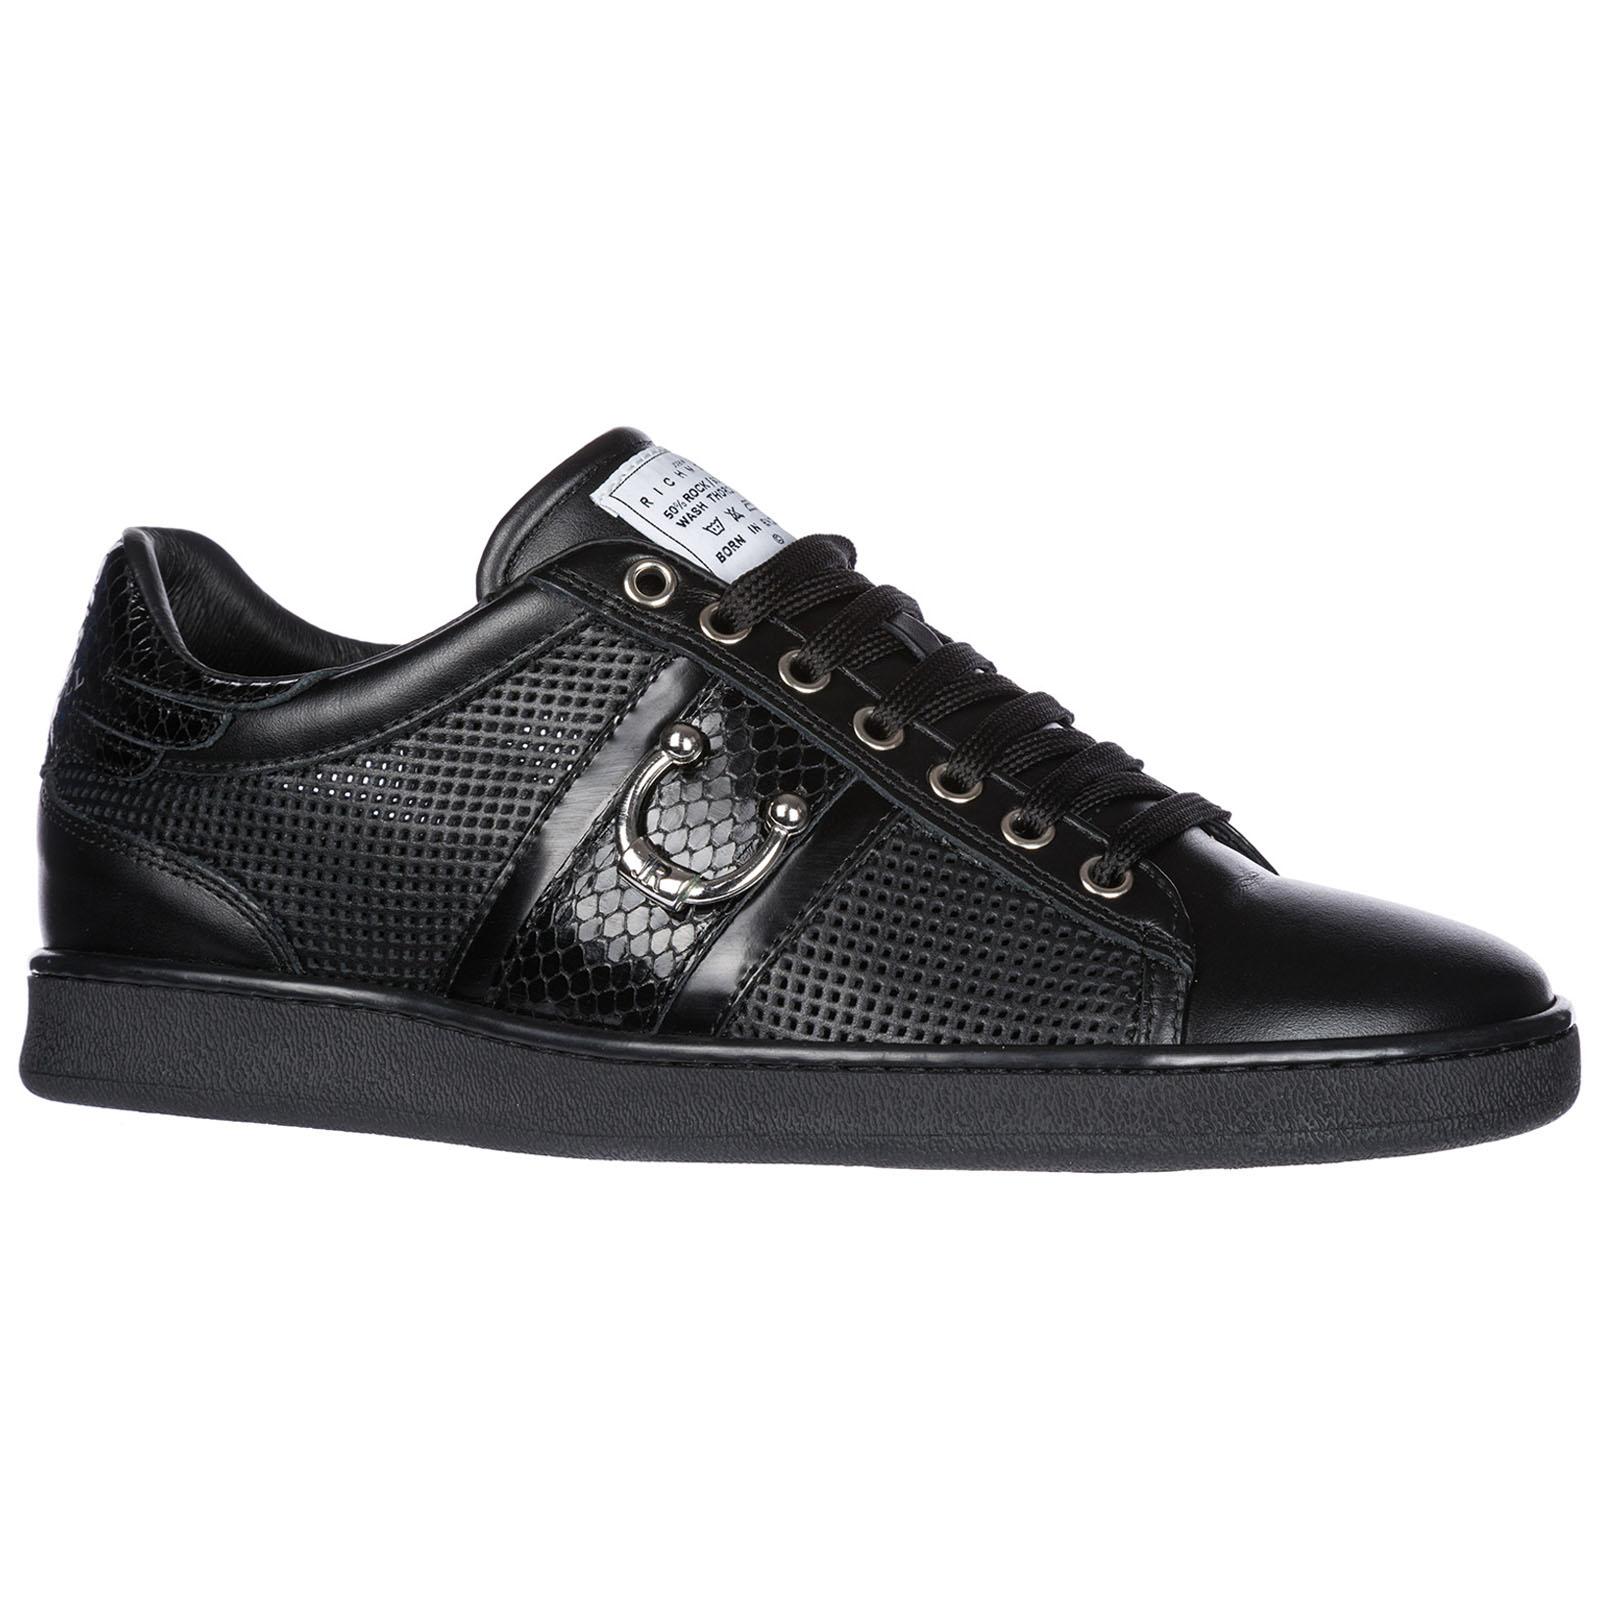 sports shoes 391c2 785db Scarpe sneakers uomo in pelle piercing